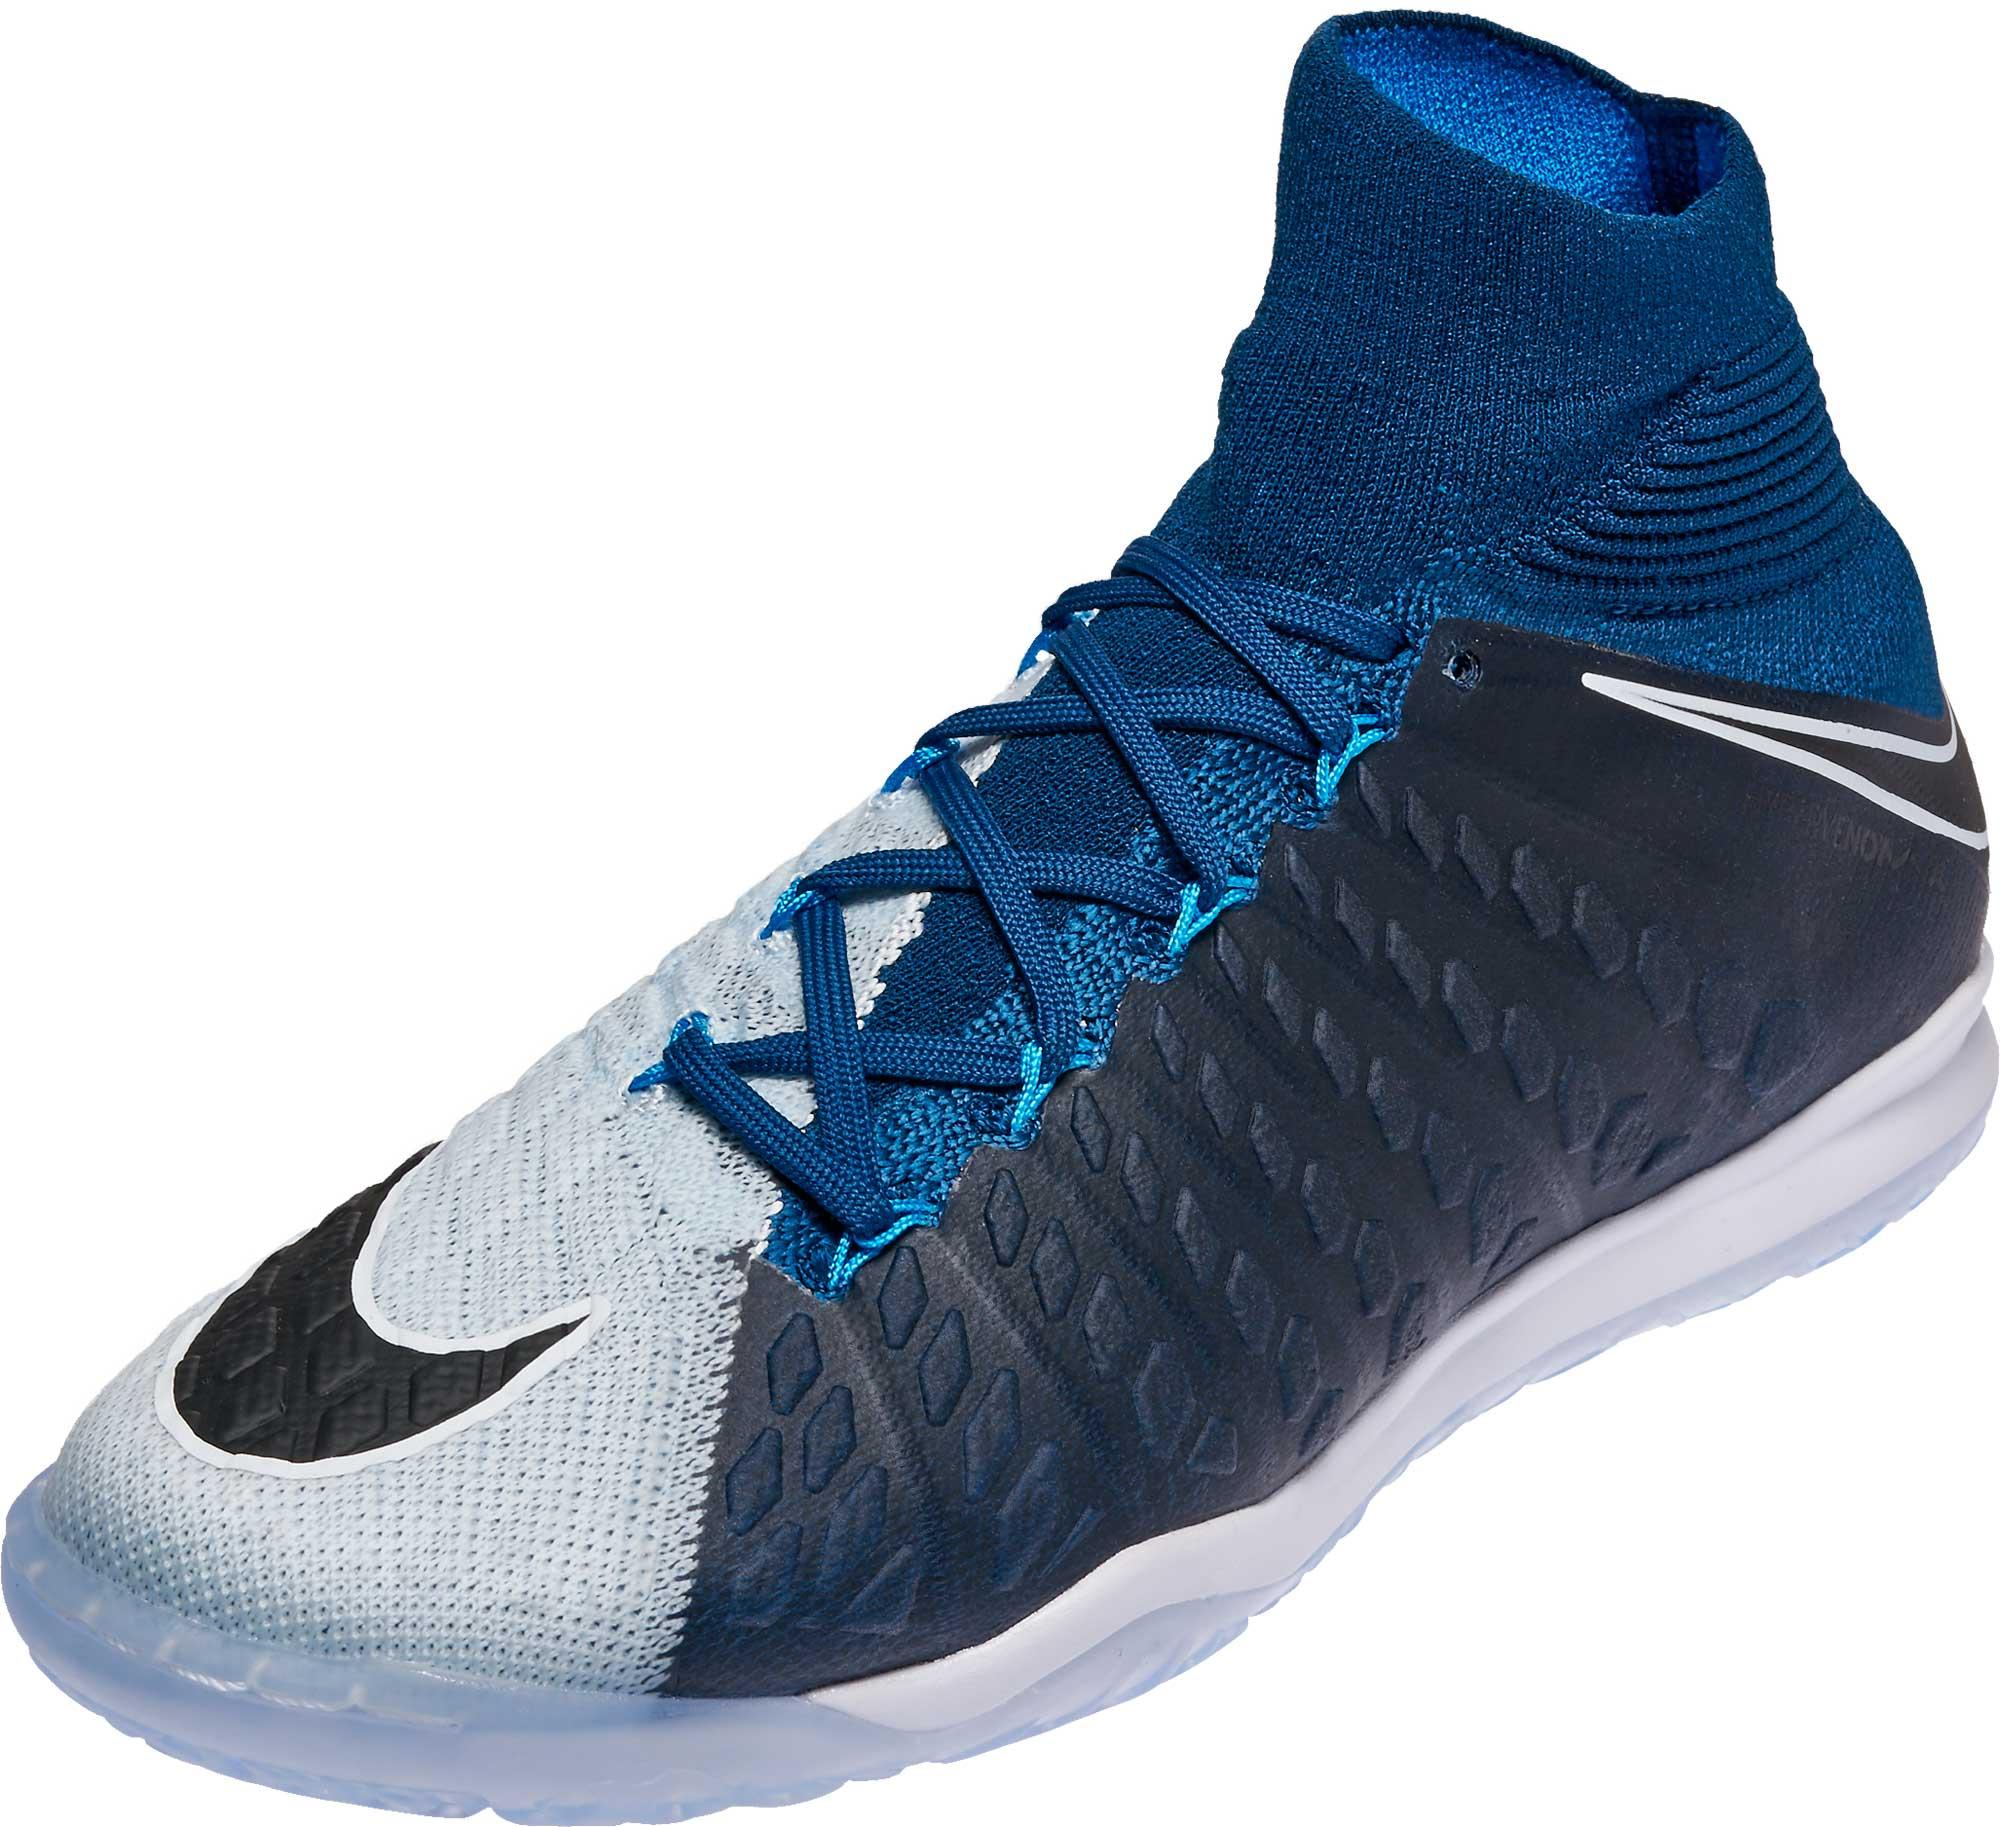 900a5b8b1 Nike HypervenomX Proximo II DF IC – Brave Blue Black